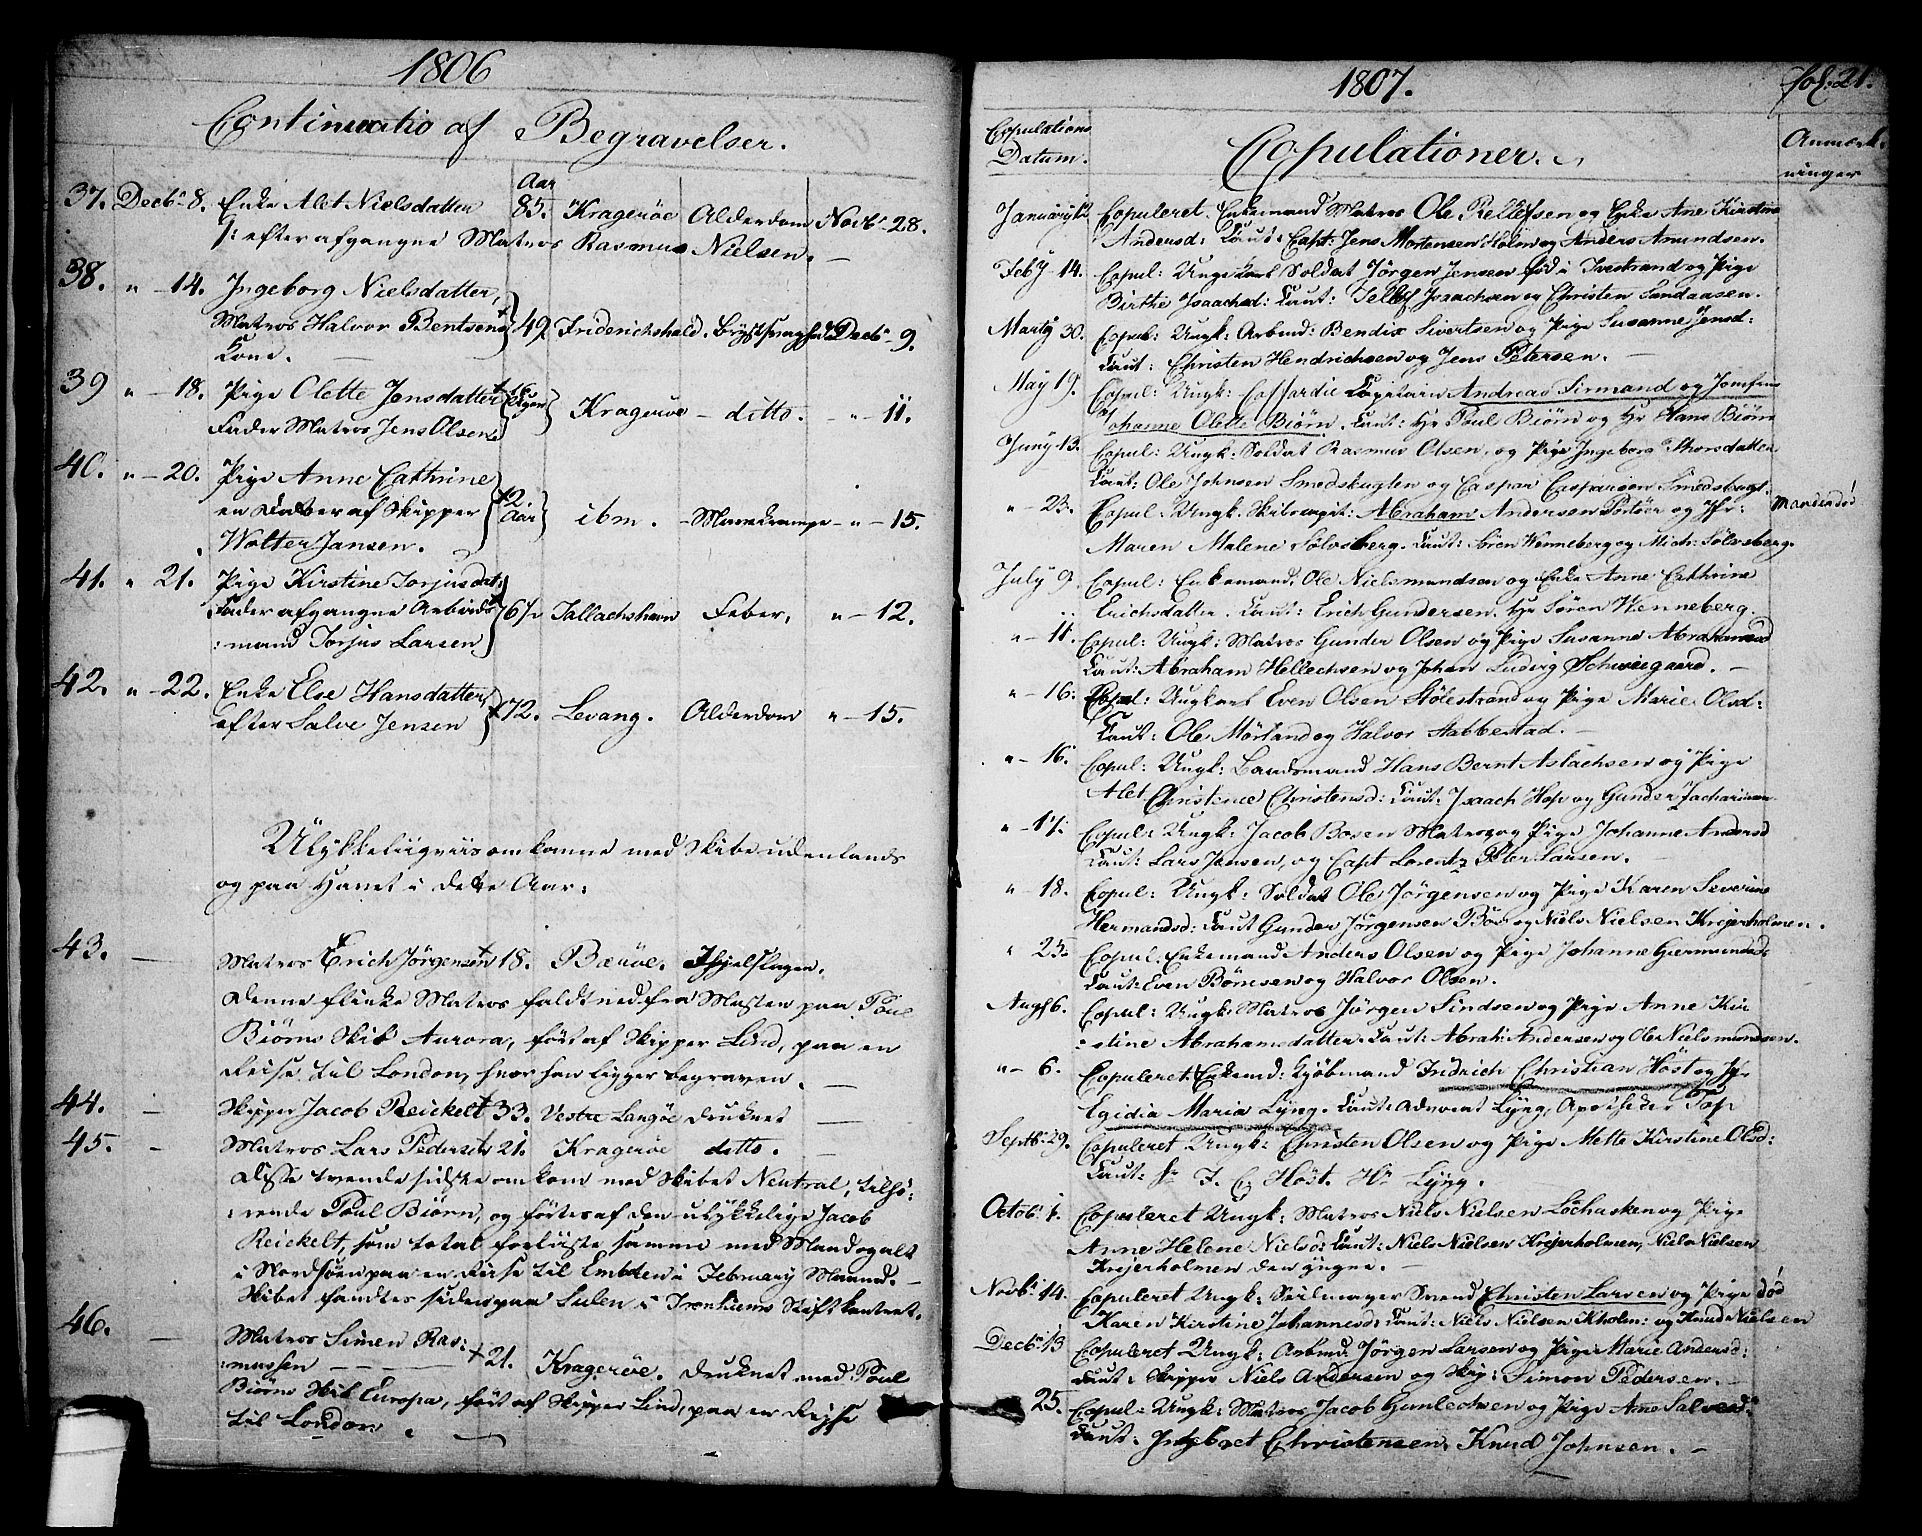 SAKO, Kragerø kirkebøker, F/Fa/L0003: Ministerialbok nr. 3, 1802-1813, s. 21